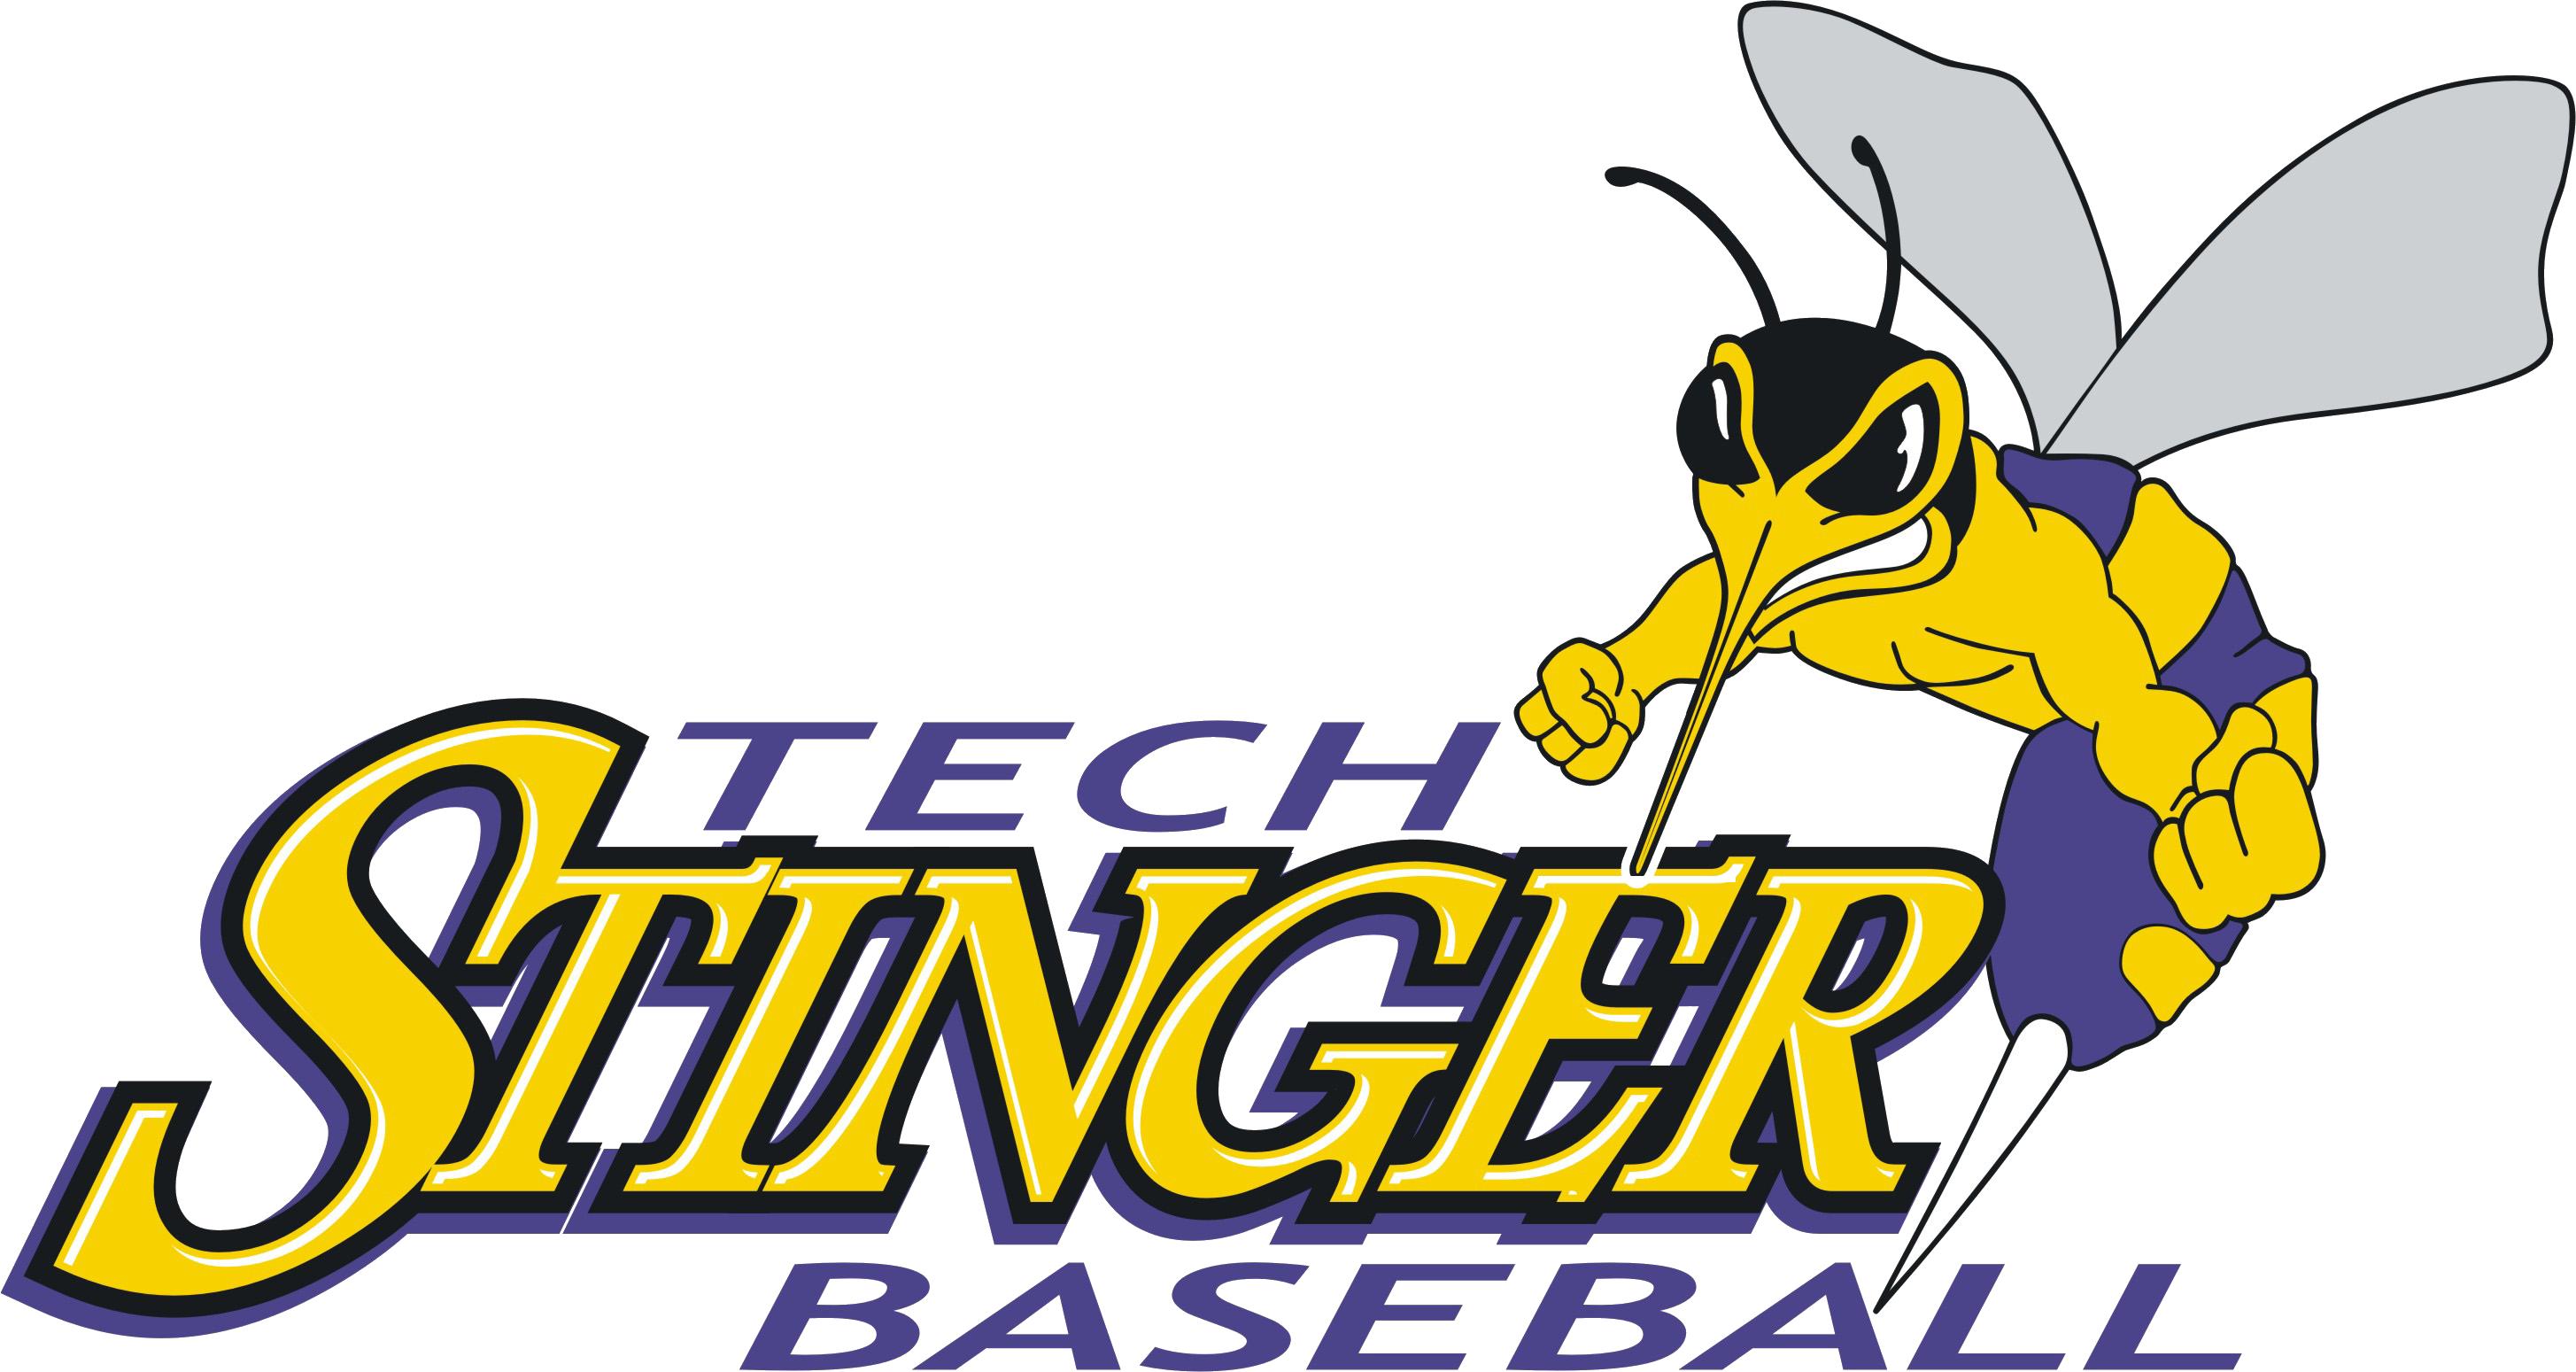 https://tnxlacademy.com/wp-content/uploads/2019/11/baseball-logo.png